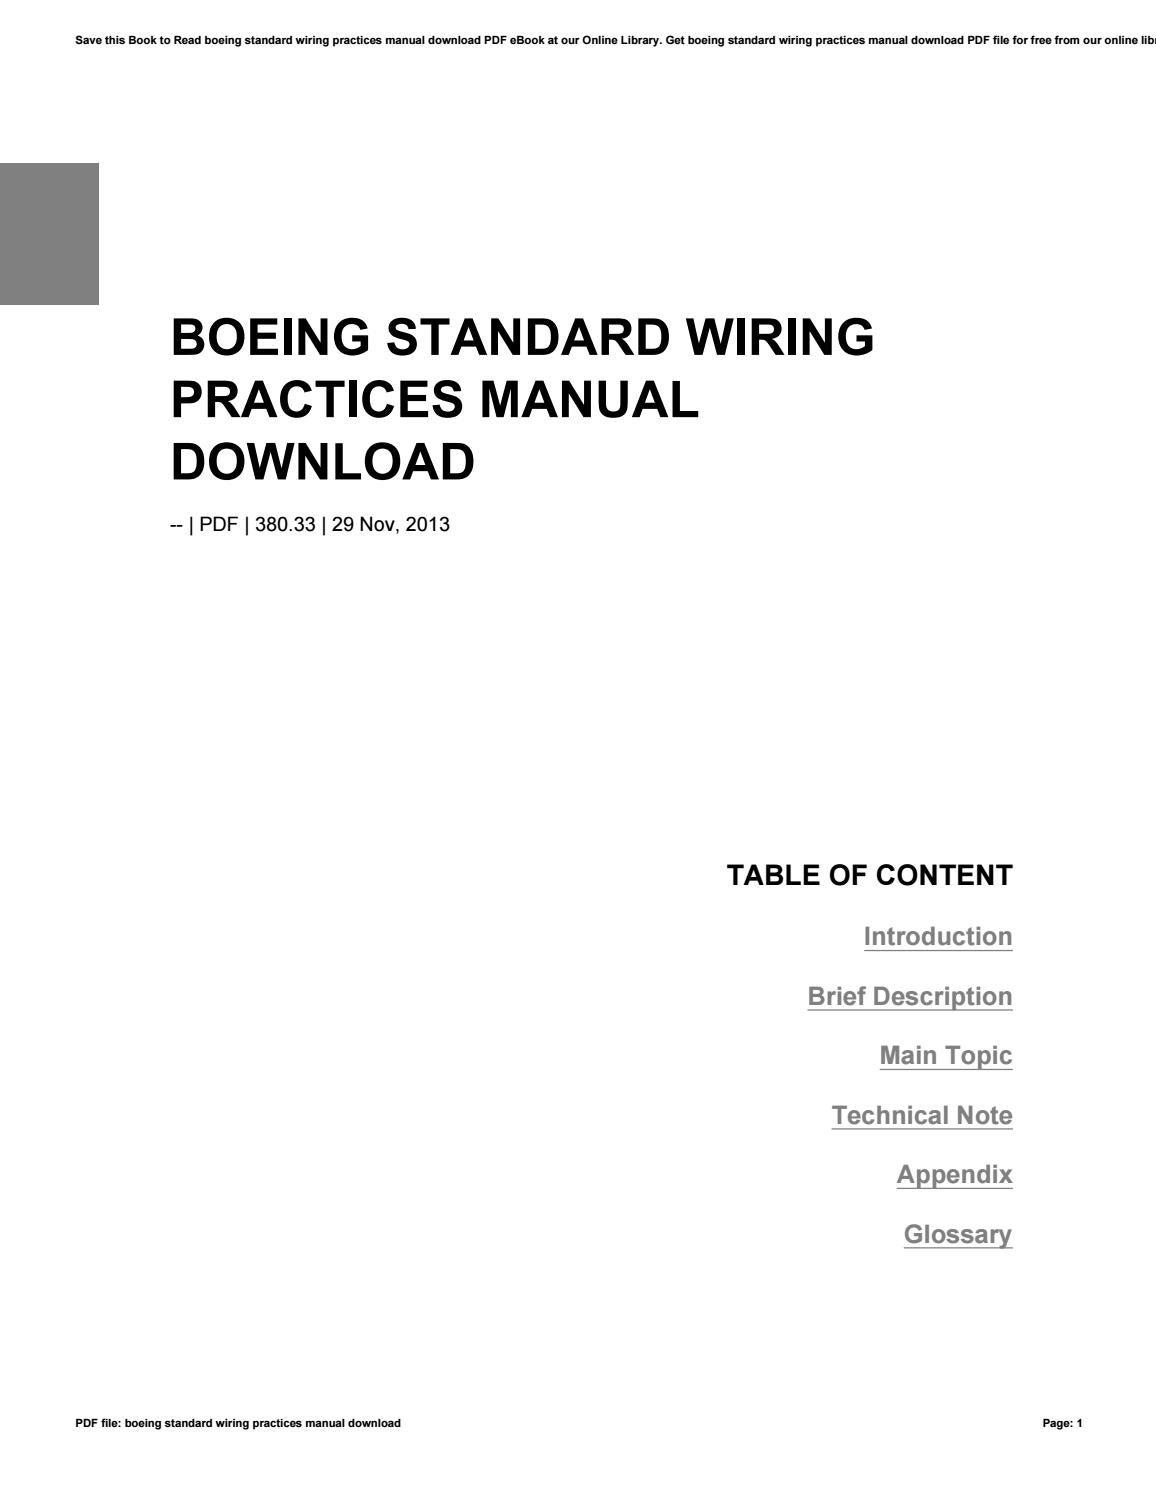 boeing standard wiring practices manual pdf